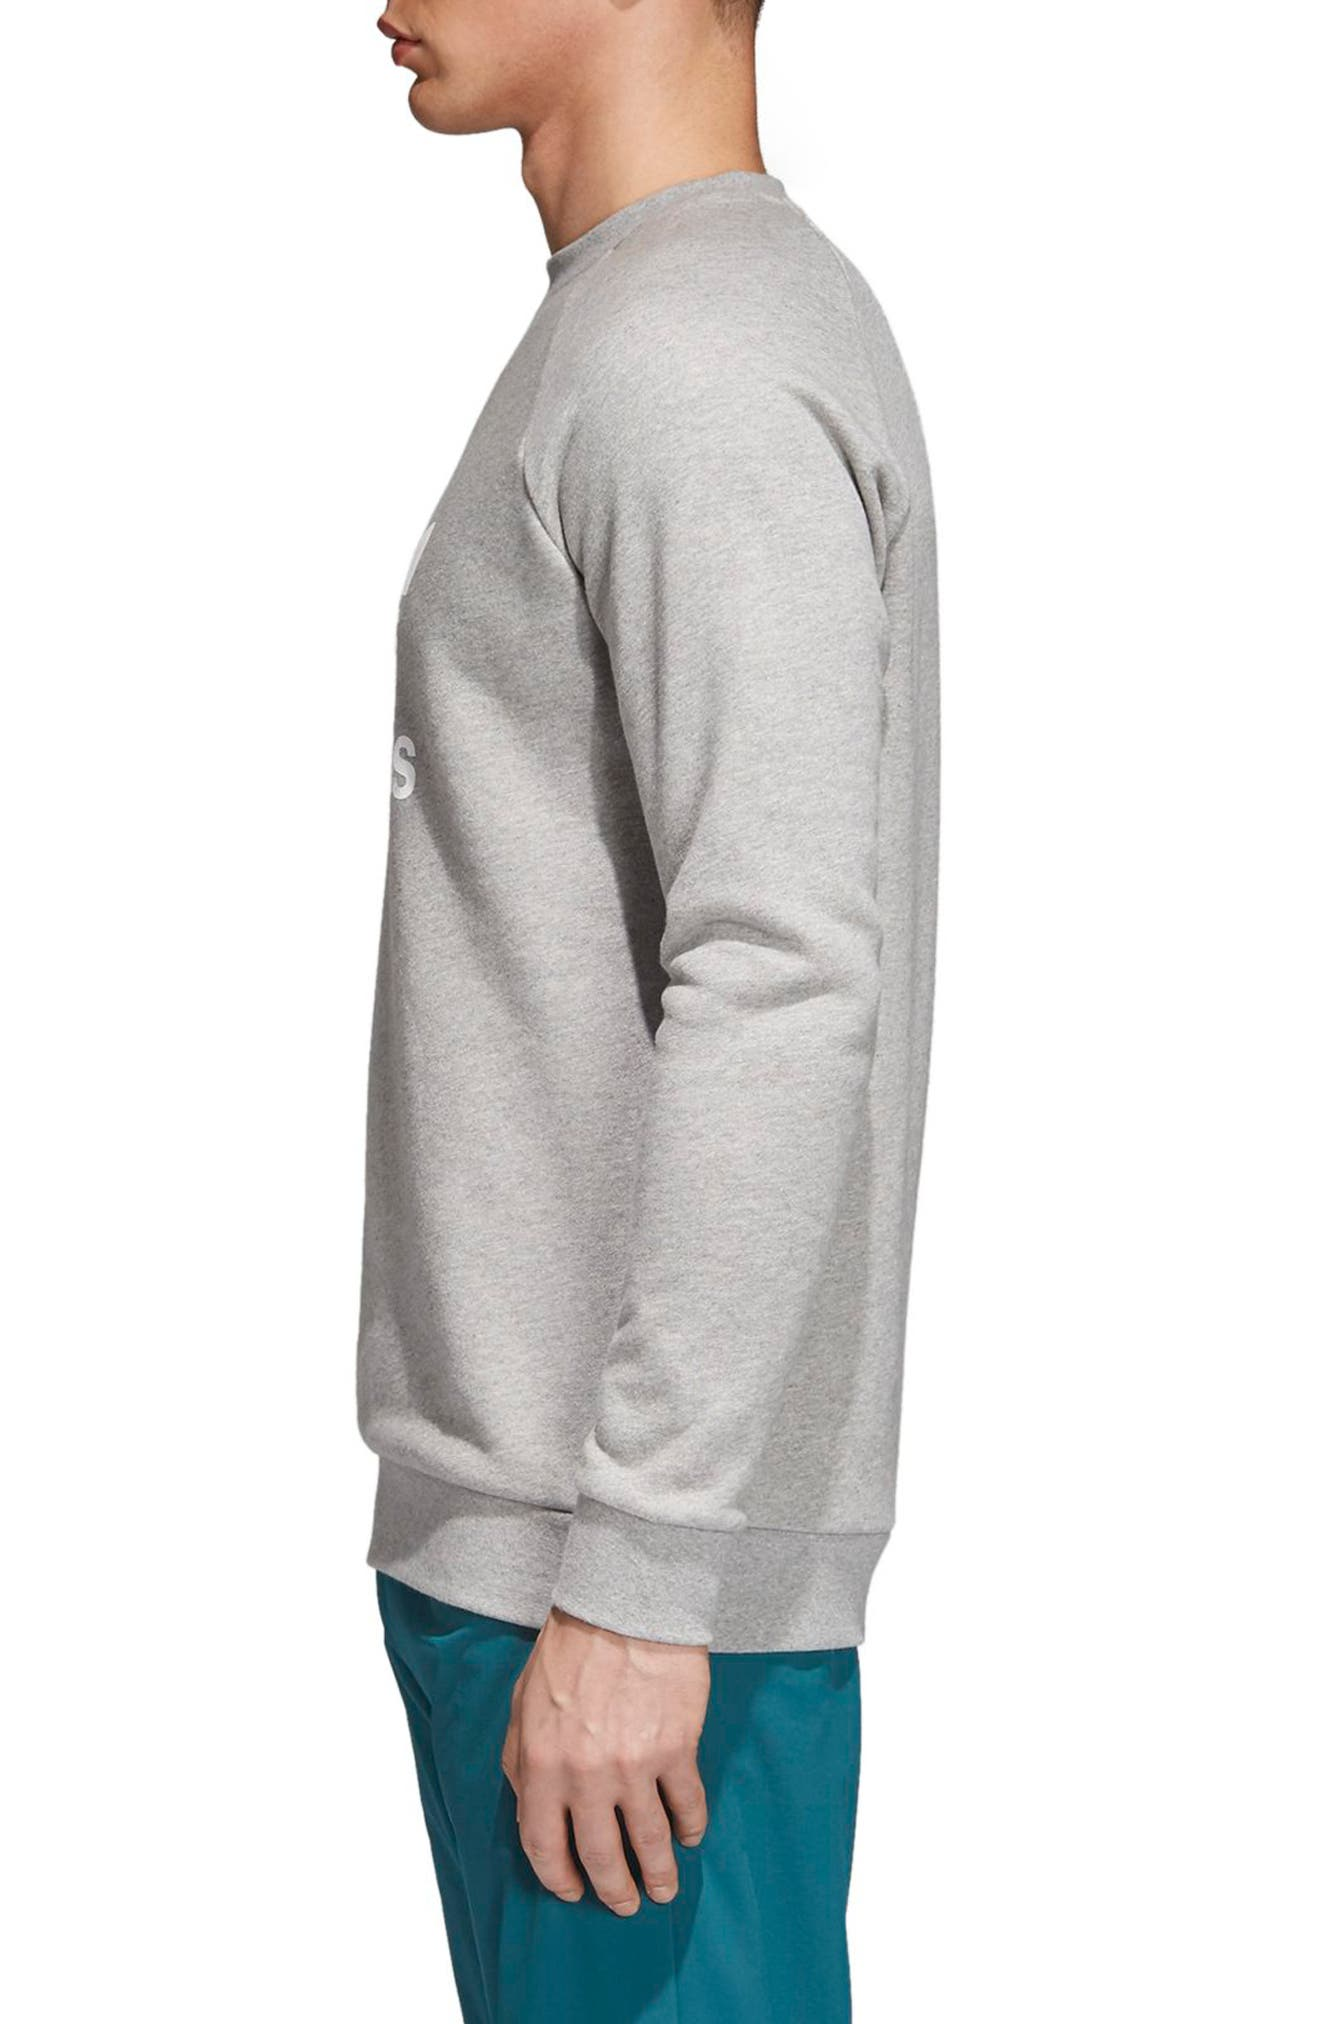 ADIDAS ORIGINALS, adidas Trefoil Crewneck Sweatshirt, Alternate thumbnail 3, color, MEDIUM GREY HEATHER